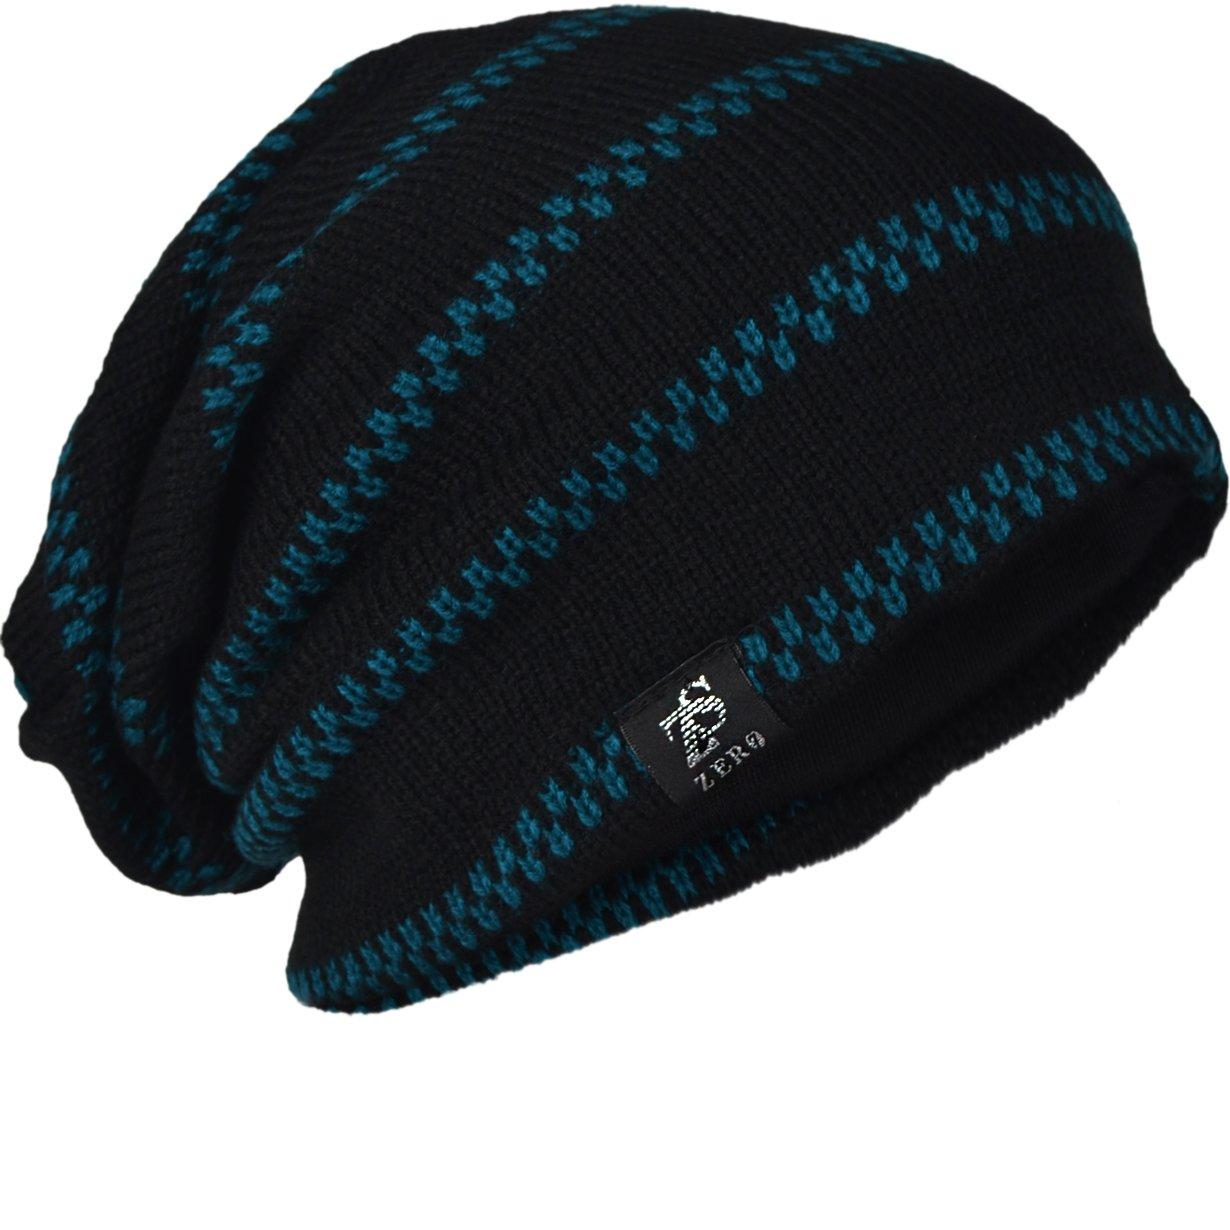 13445c8227d FORBUSITE Men Knit Slouchy Summer Beanie Skull Cap Winter Hat B734 (Black)  at Amazon Men s Clothing store